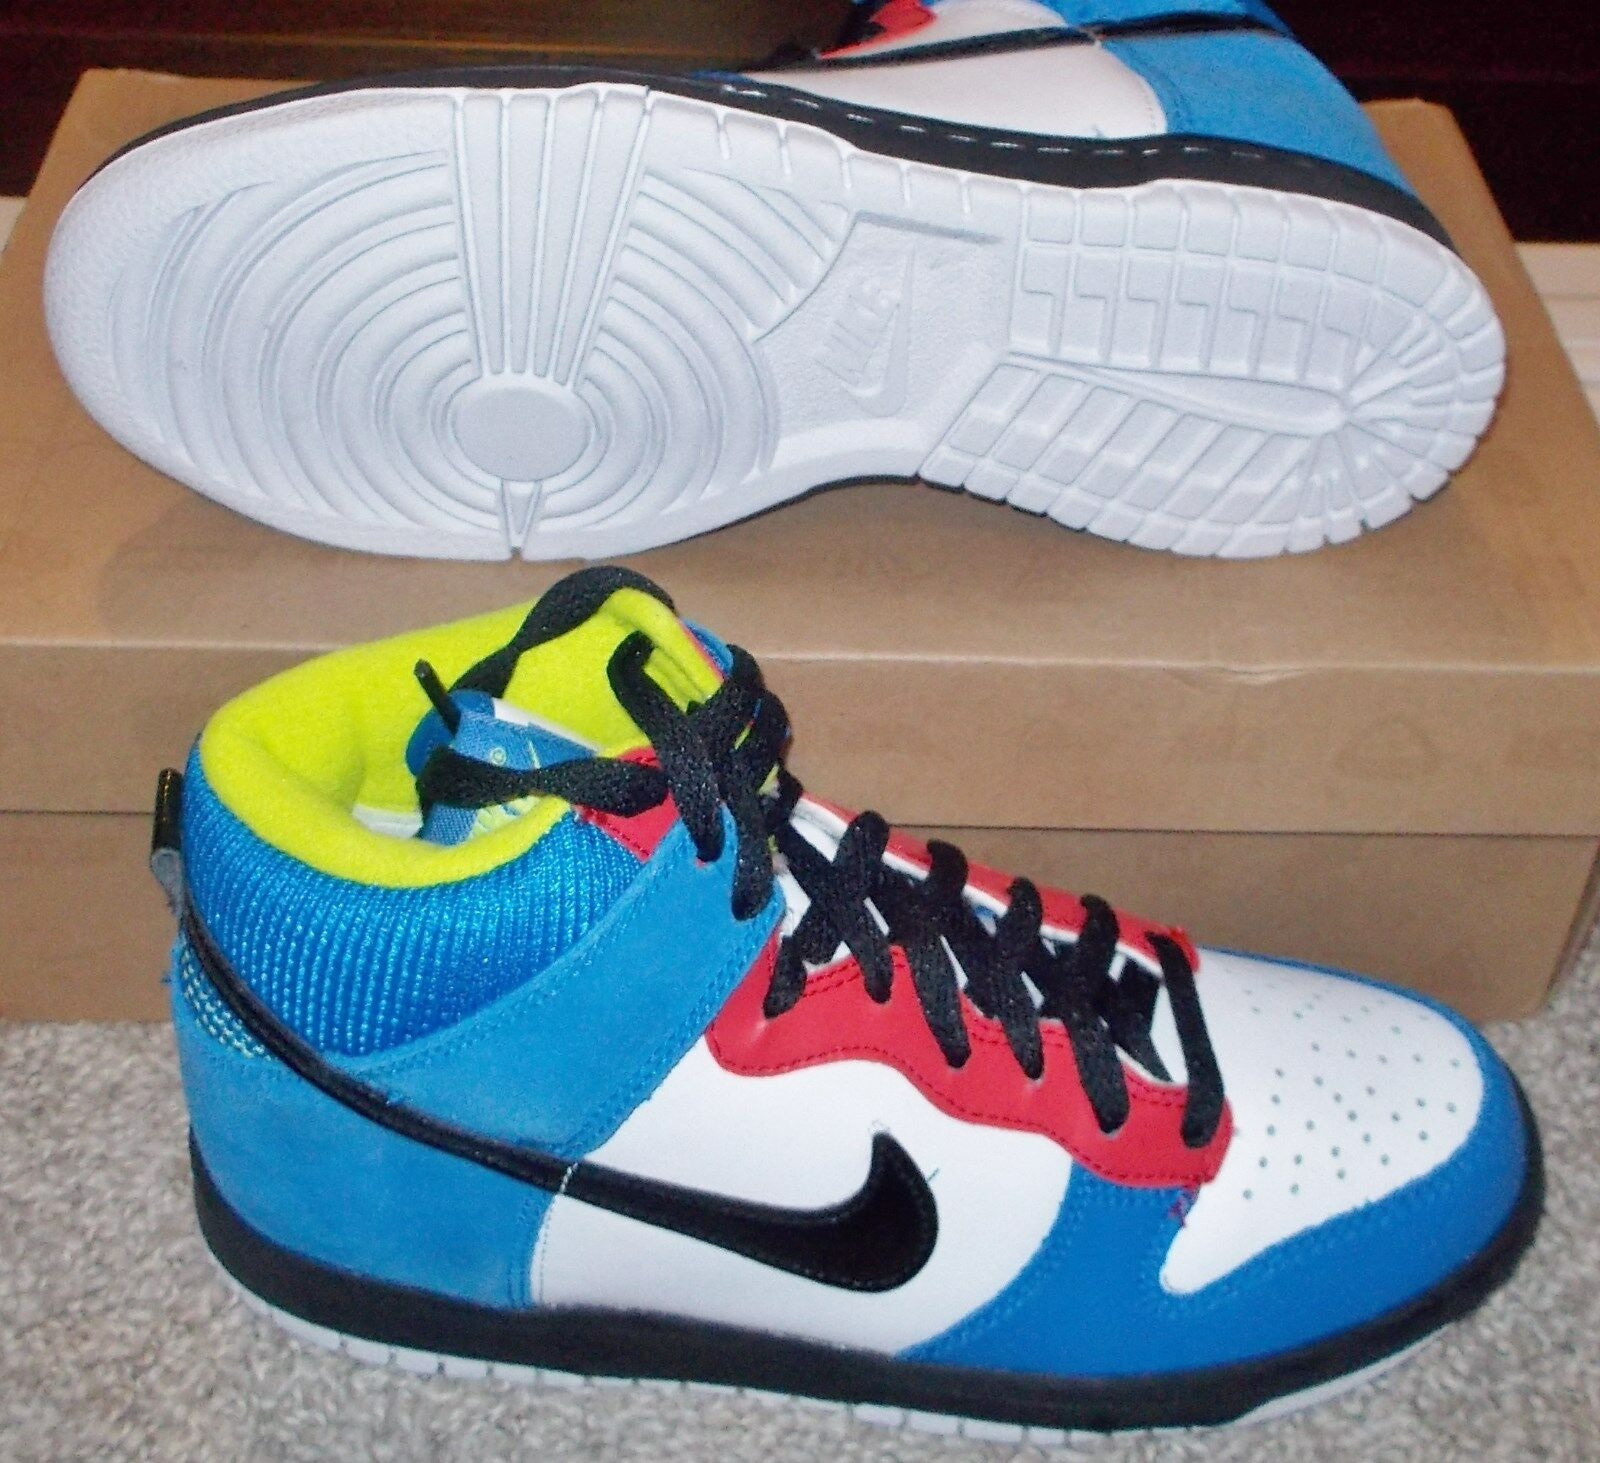 NEW Nike DUNK HIGH Skittles Damenschuhe 6.5 (5Y) LTD NIB sb NR